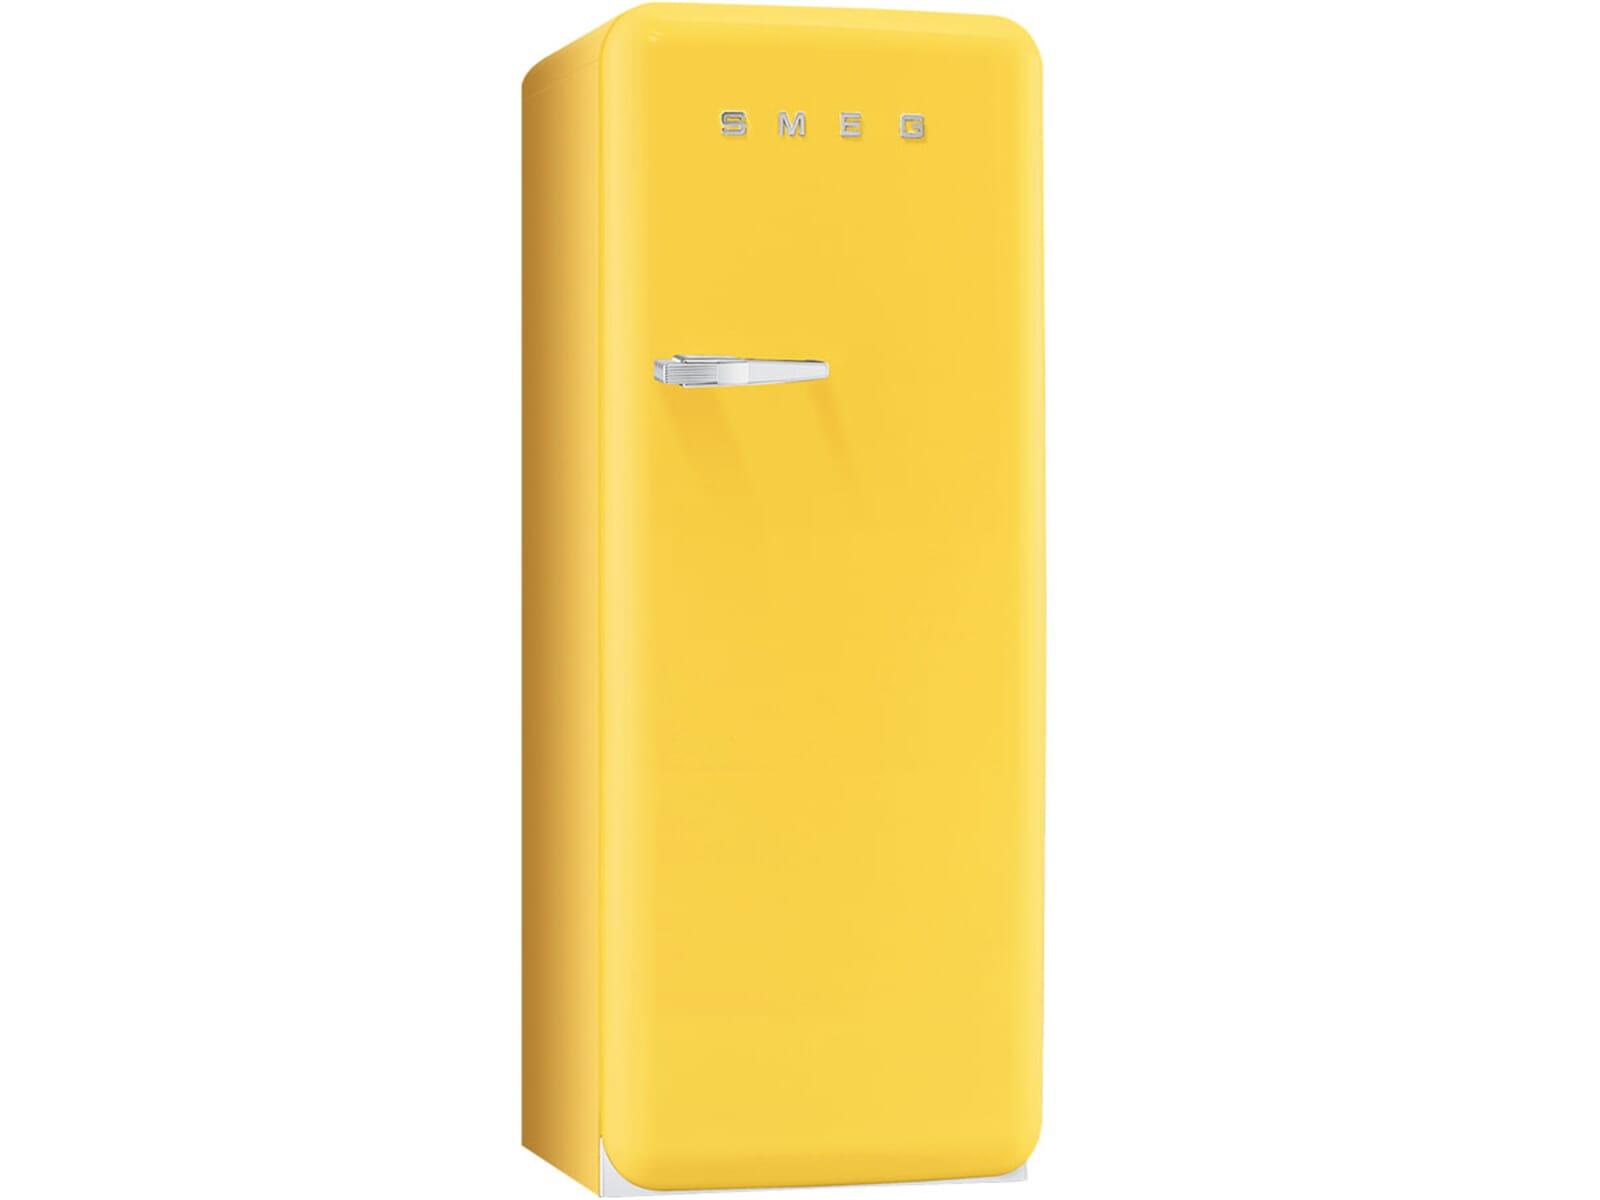 Retro Kühlschrank Pastellblau : Smeg fab28rg1 standkühlschrank sonnengelb